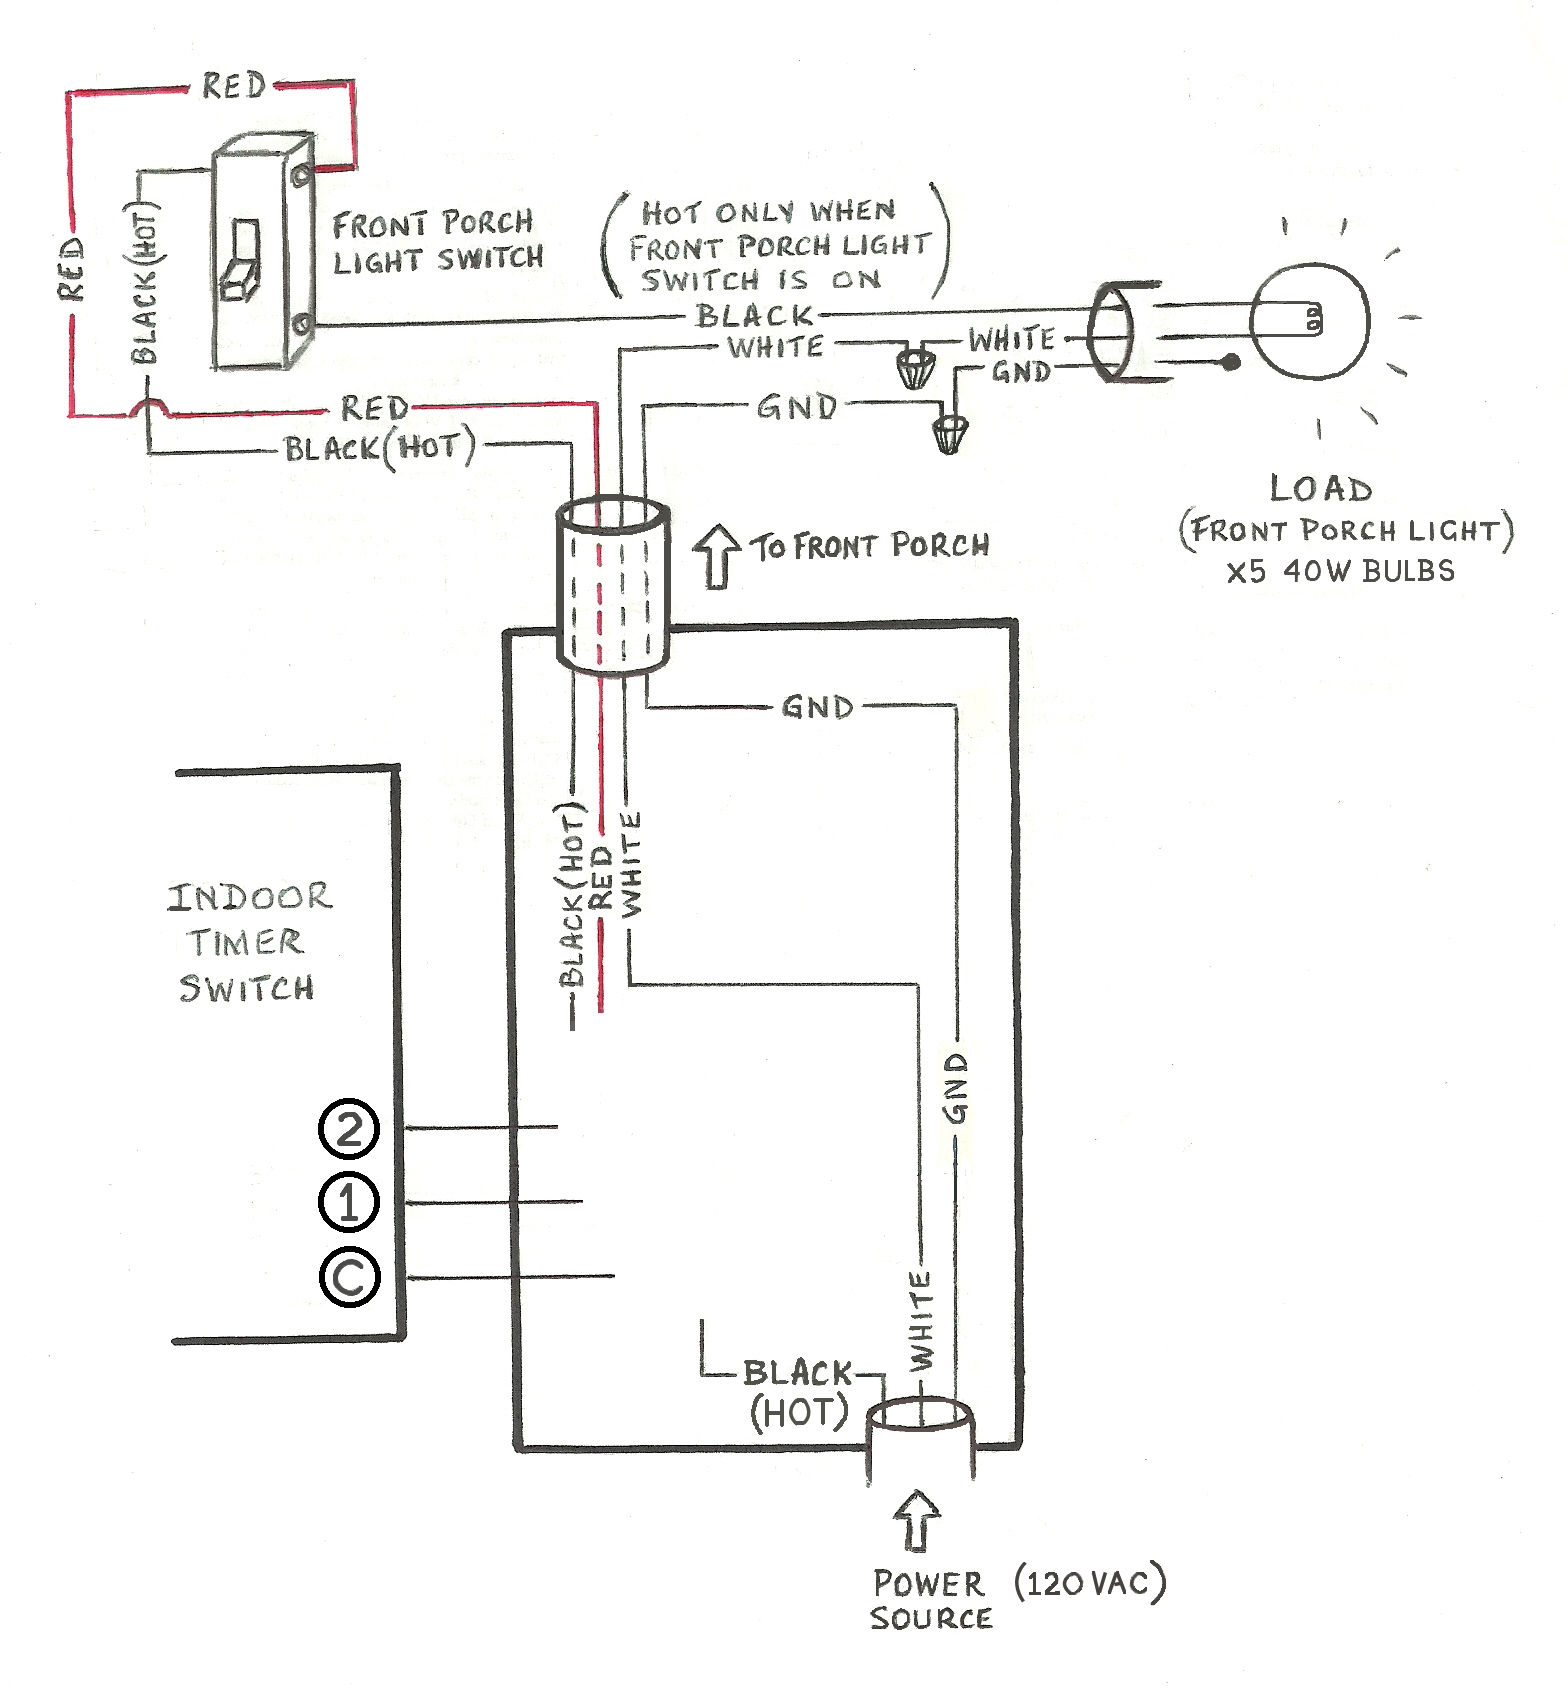 Limitorque Electric Actuators Wiring Diagram